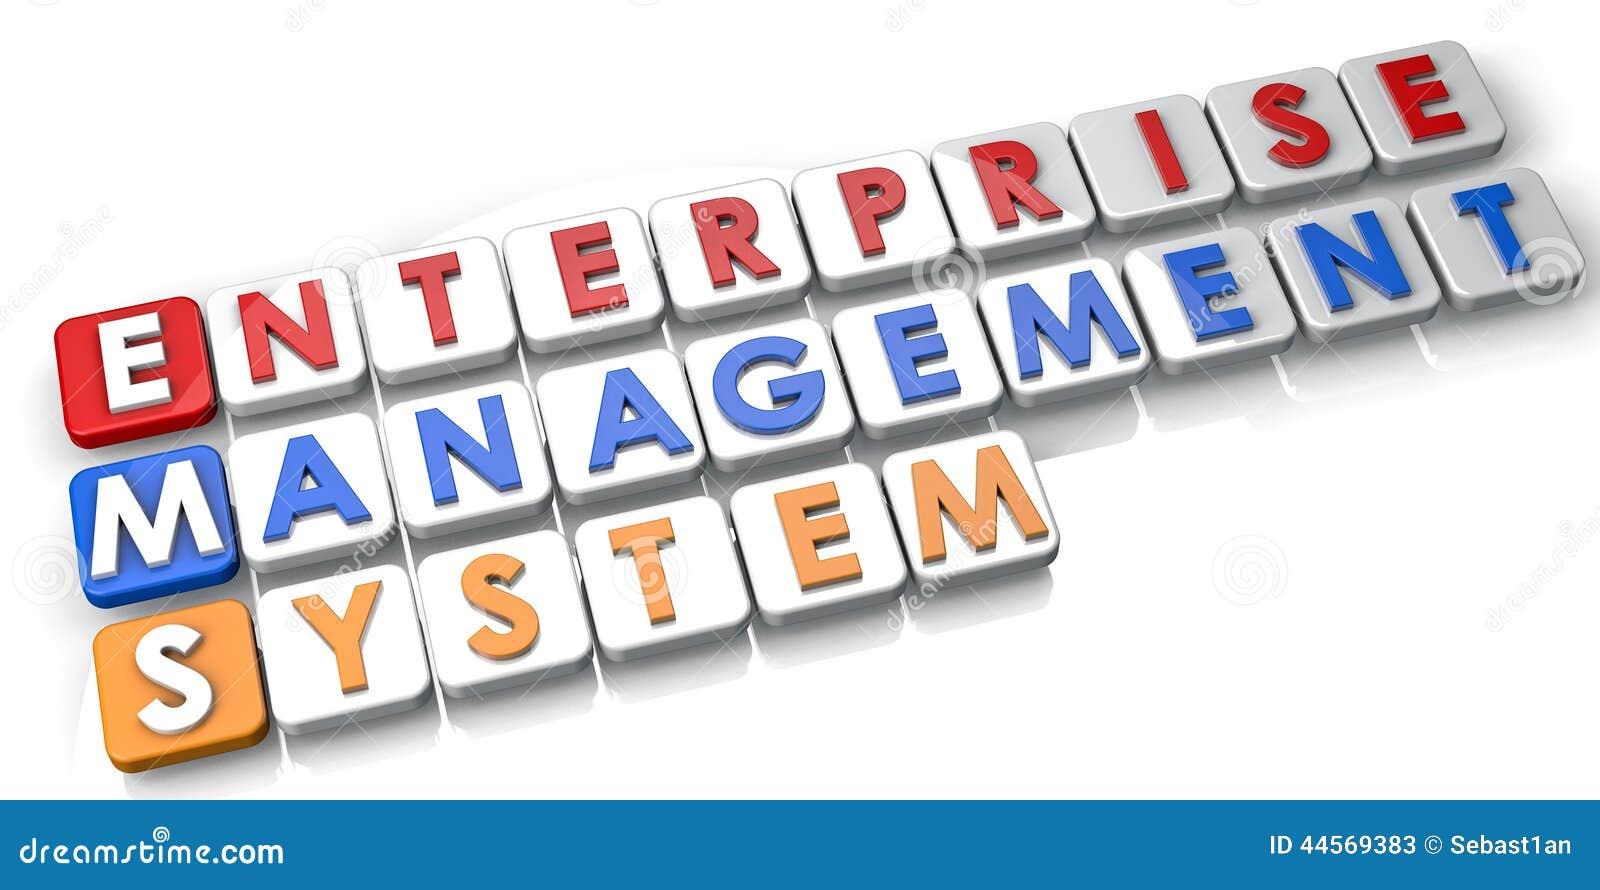 Management System